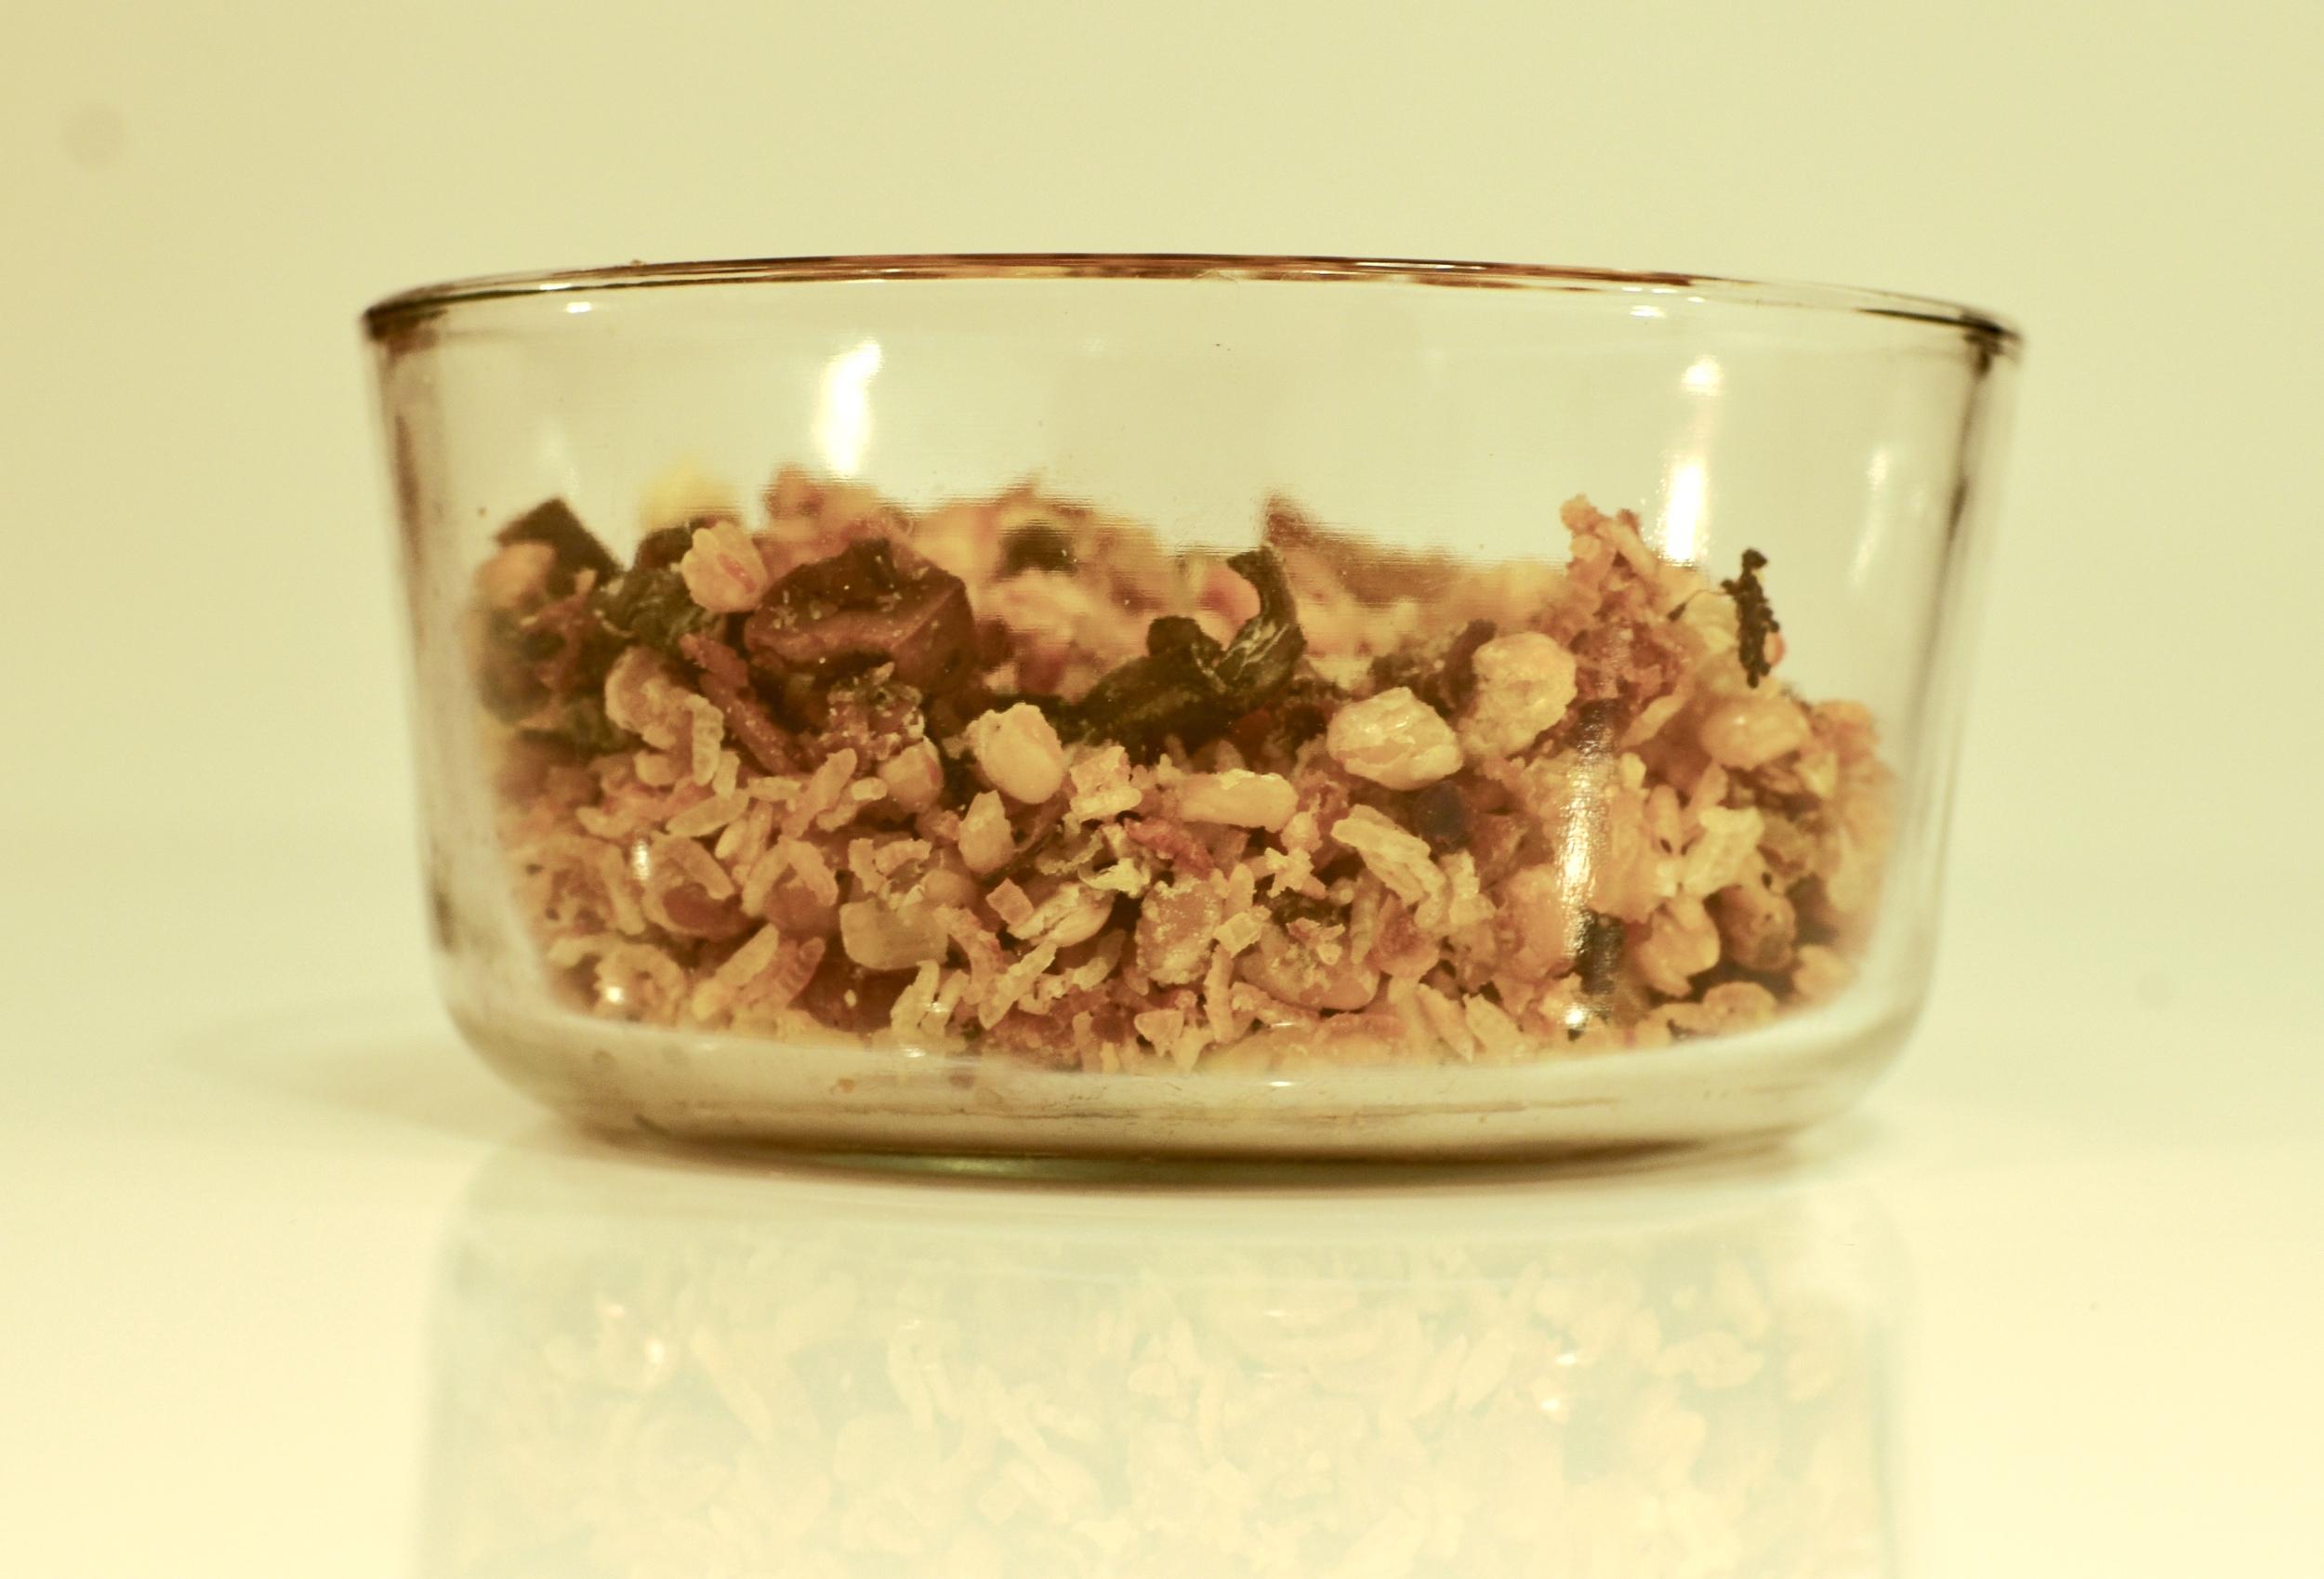 Last prototype - dehydrated, nutrient-balanced hog feed